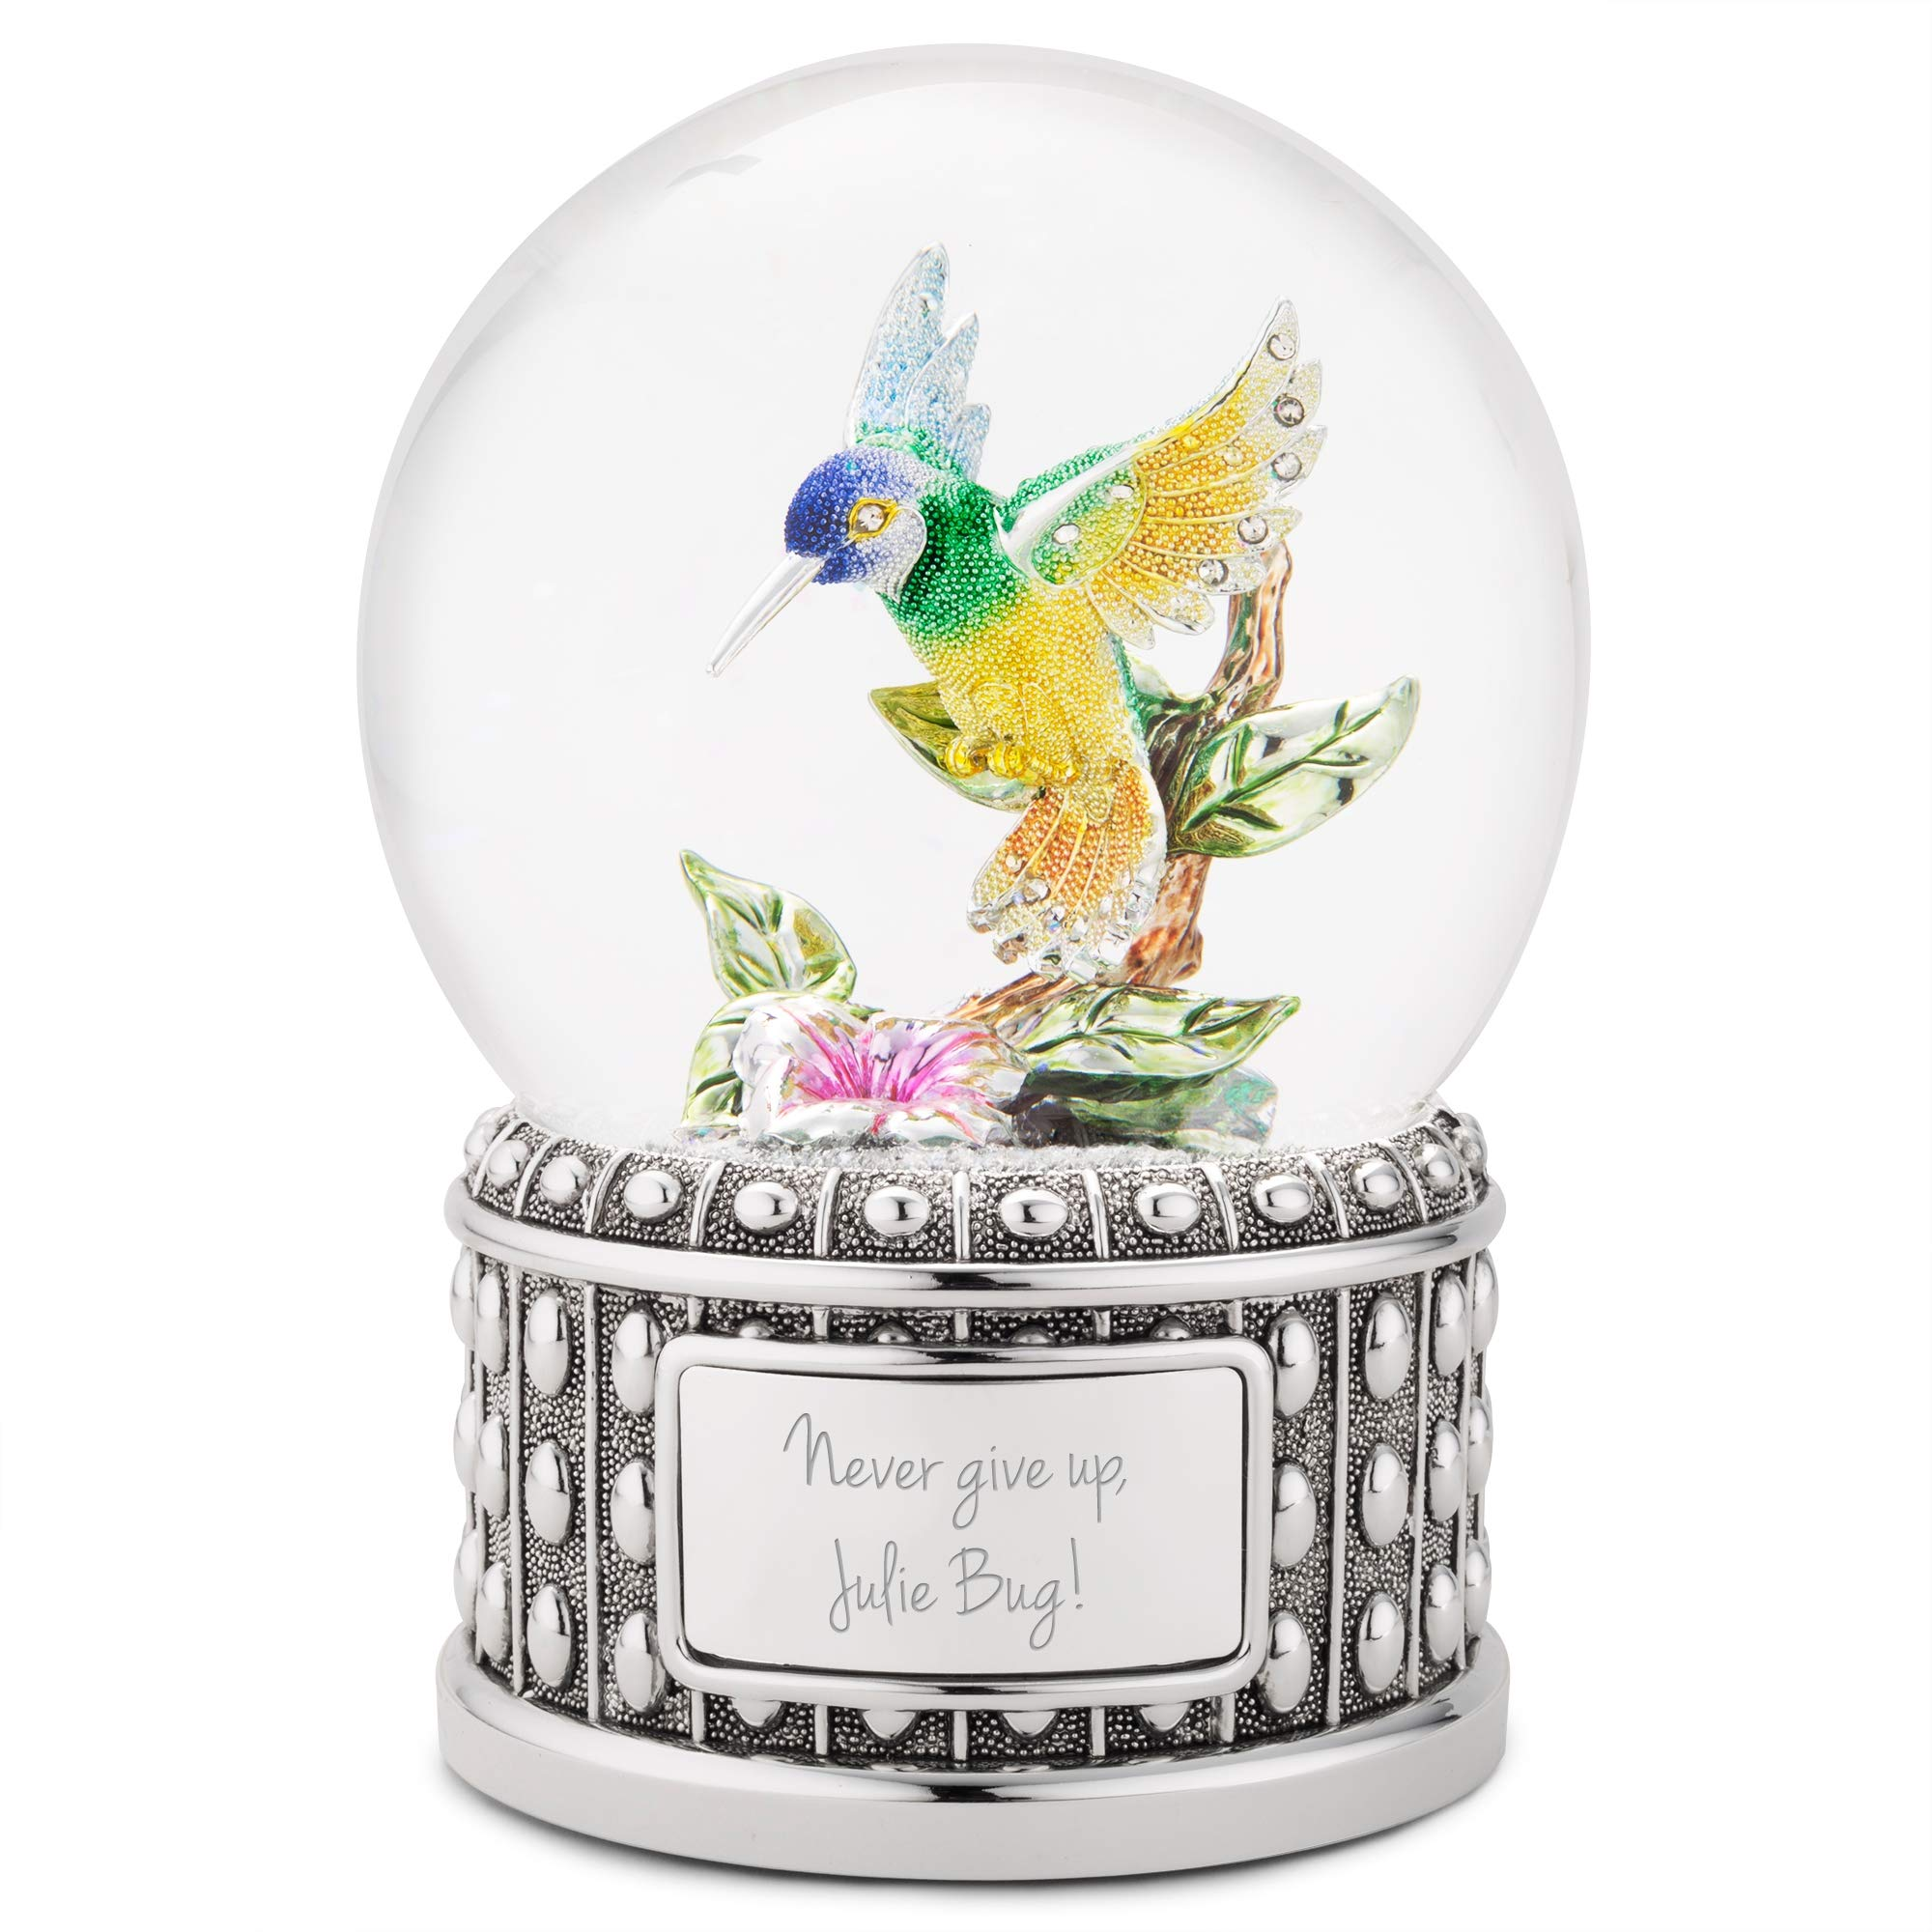 Image of Personalized Hummingbird Musical Water Globe